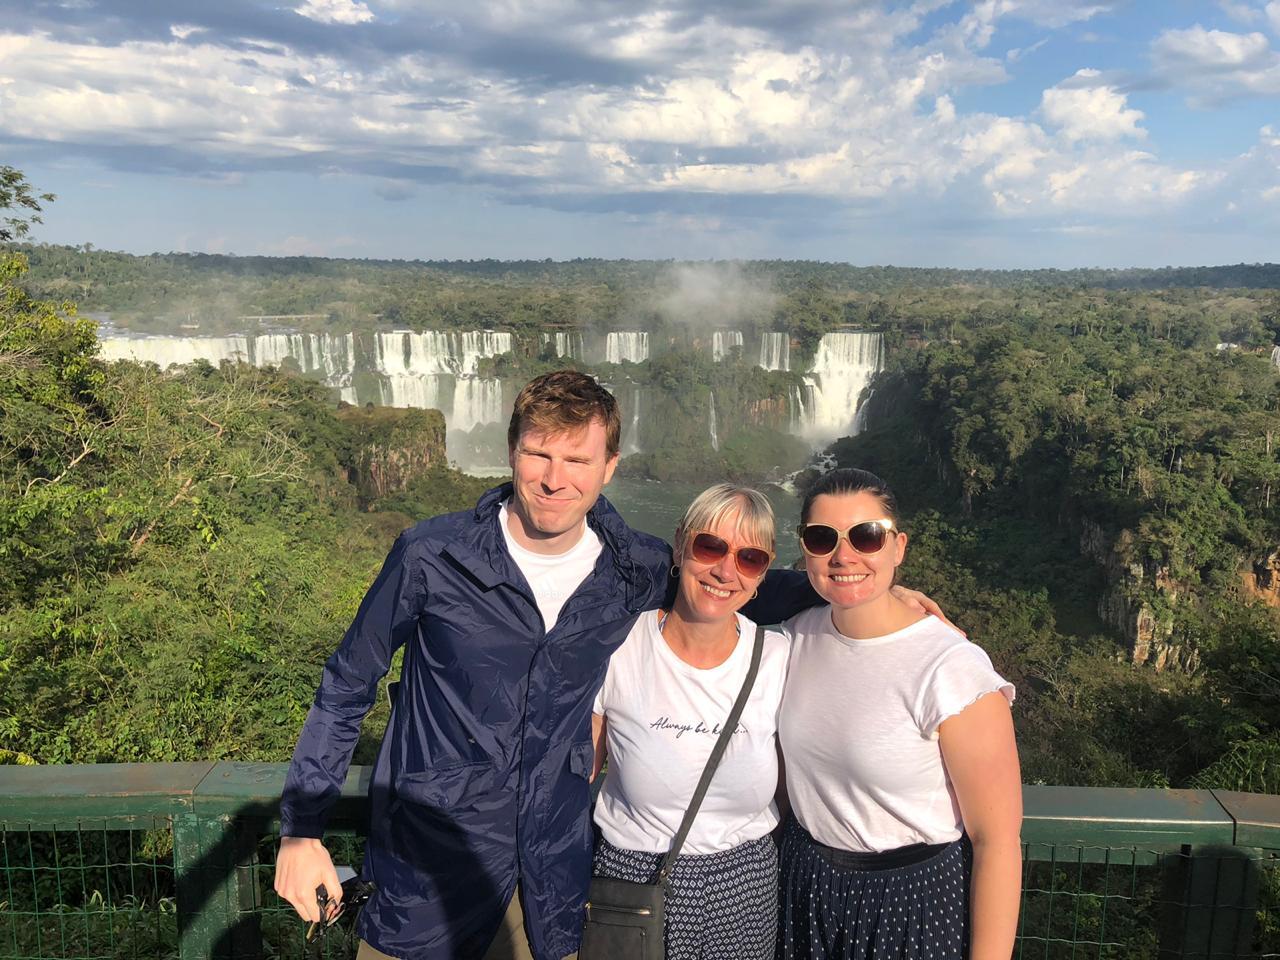 FOZ COMBO 1 - Arriving Foz do Iguaçu | Staying in Foz do Iguaçu | Brazil Side of Falls Only | Departing Foz do Iguaçu